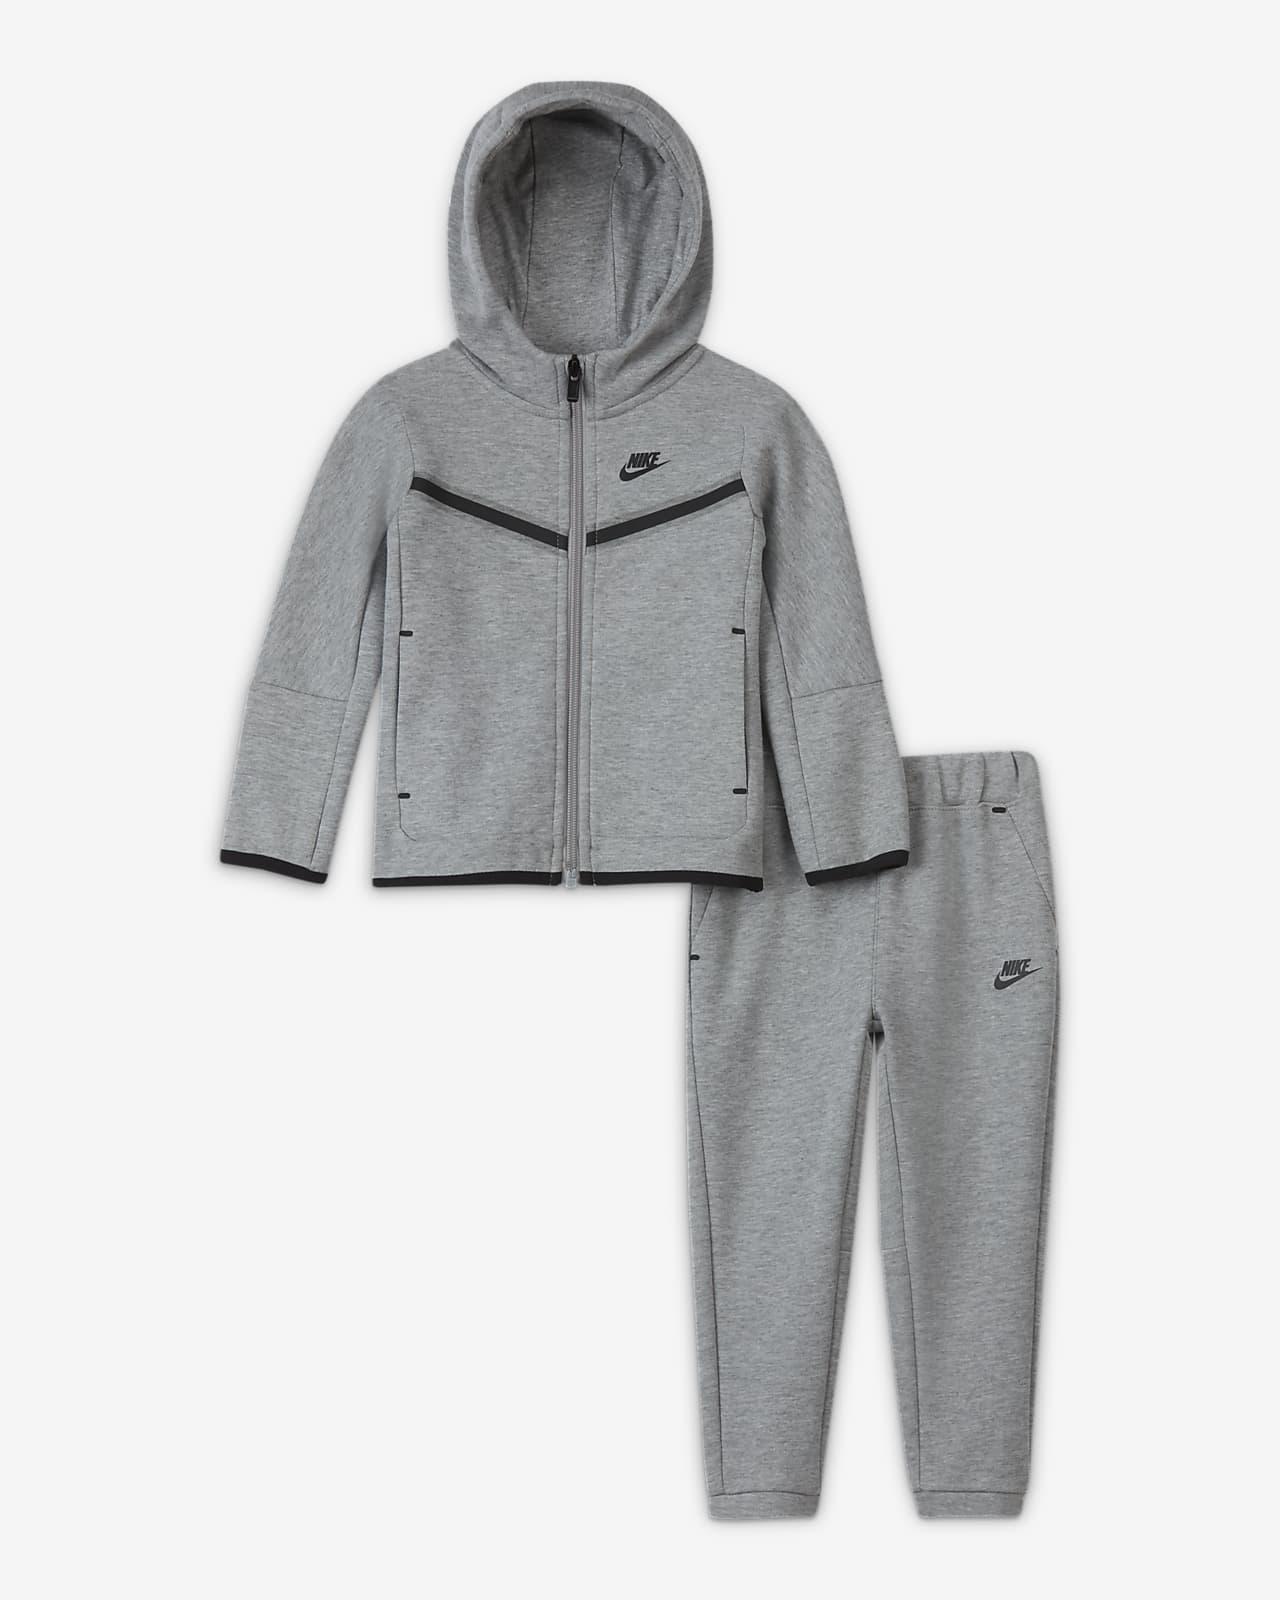 Nike Sportsweear Tech Fleece-sæt med bukser og hættetrøje med lynlås til babyer (12-24 M)